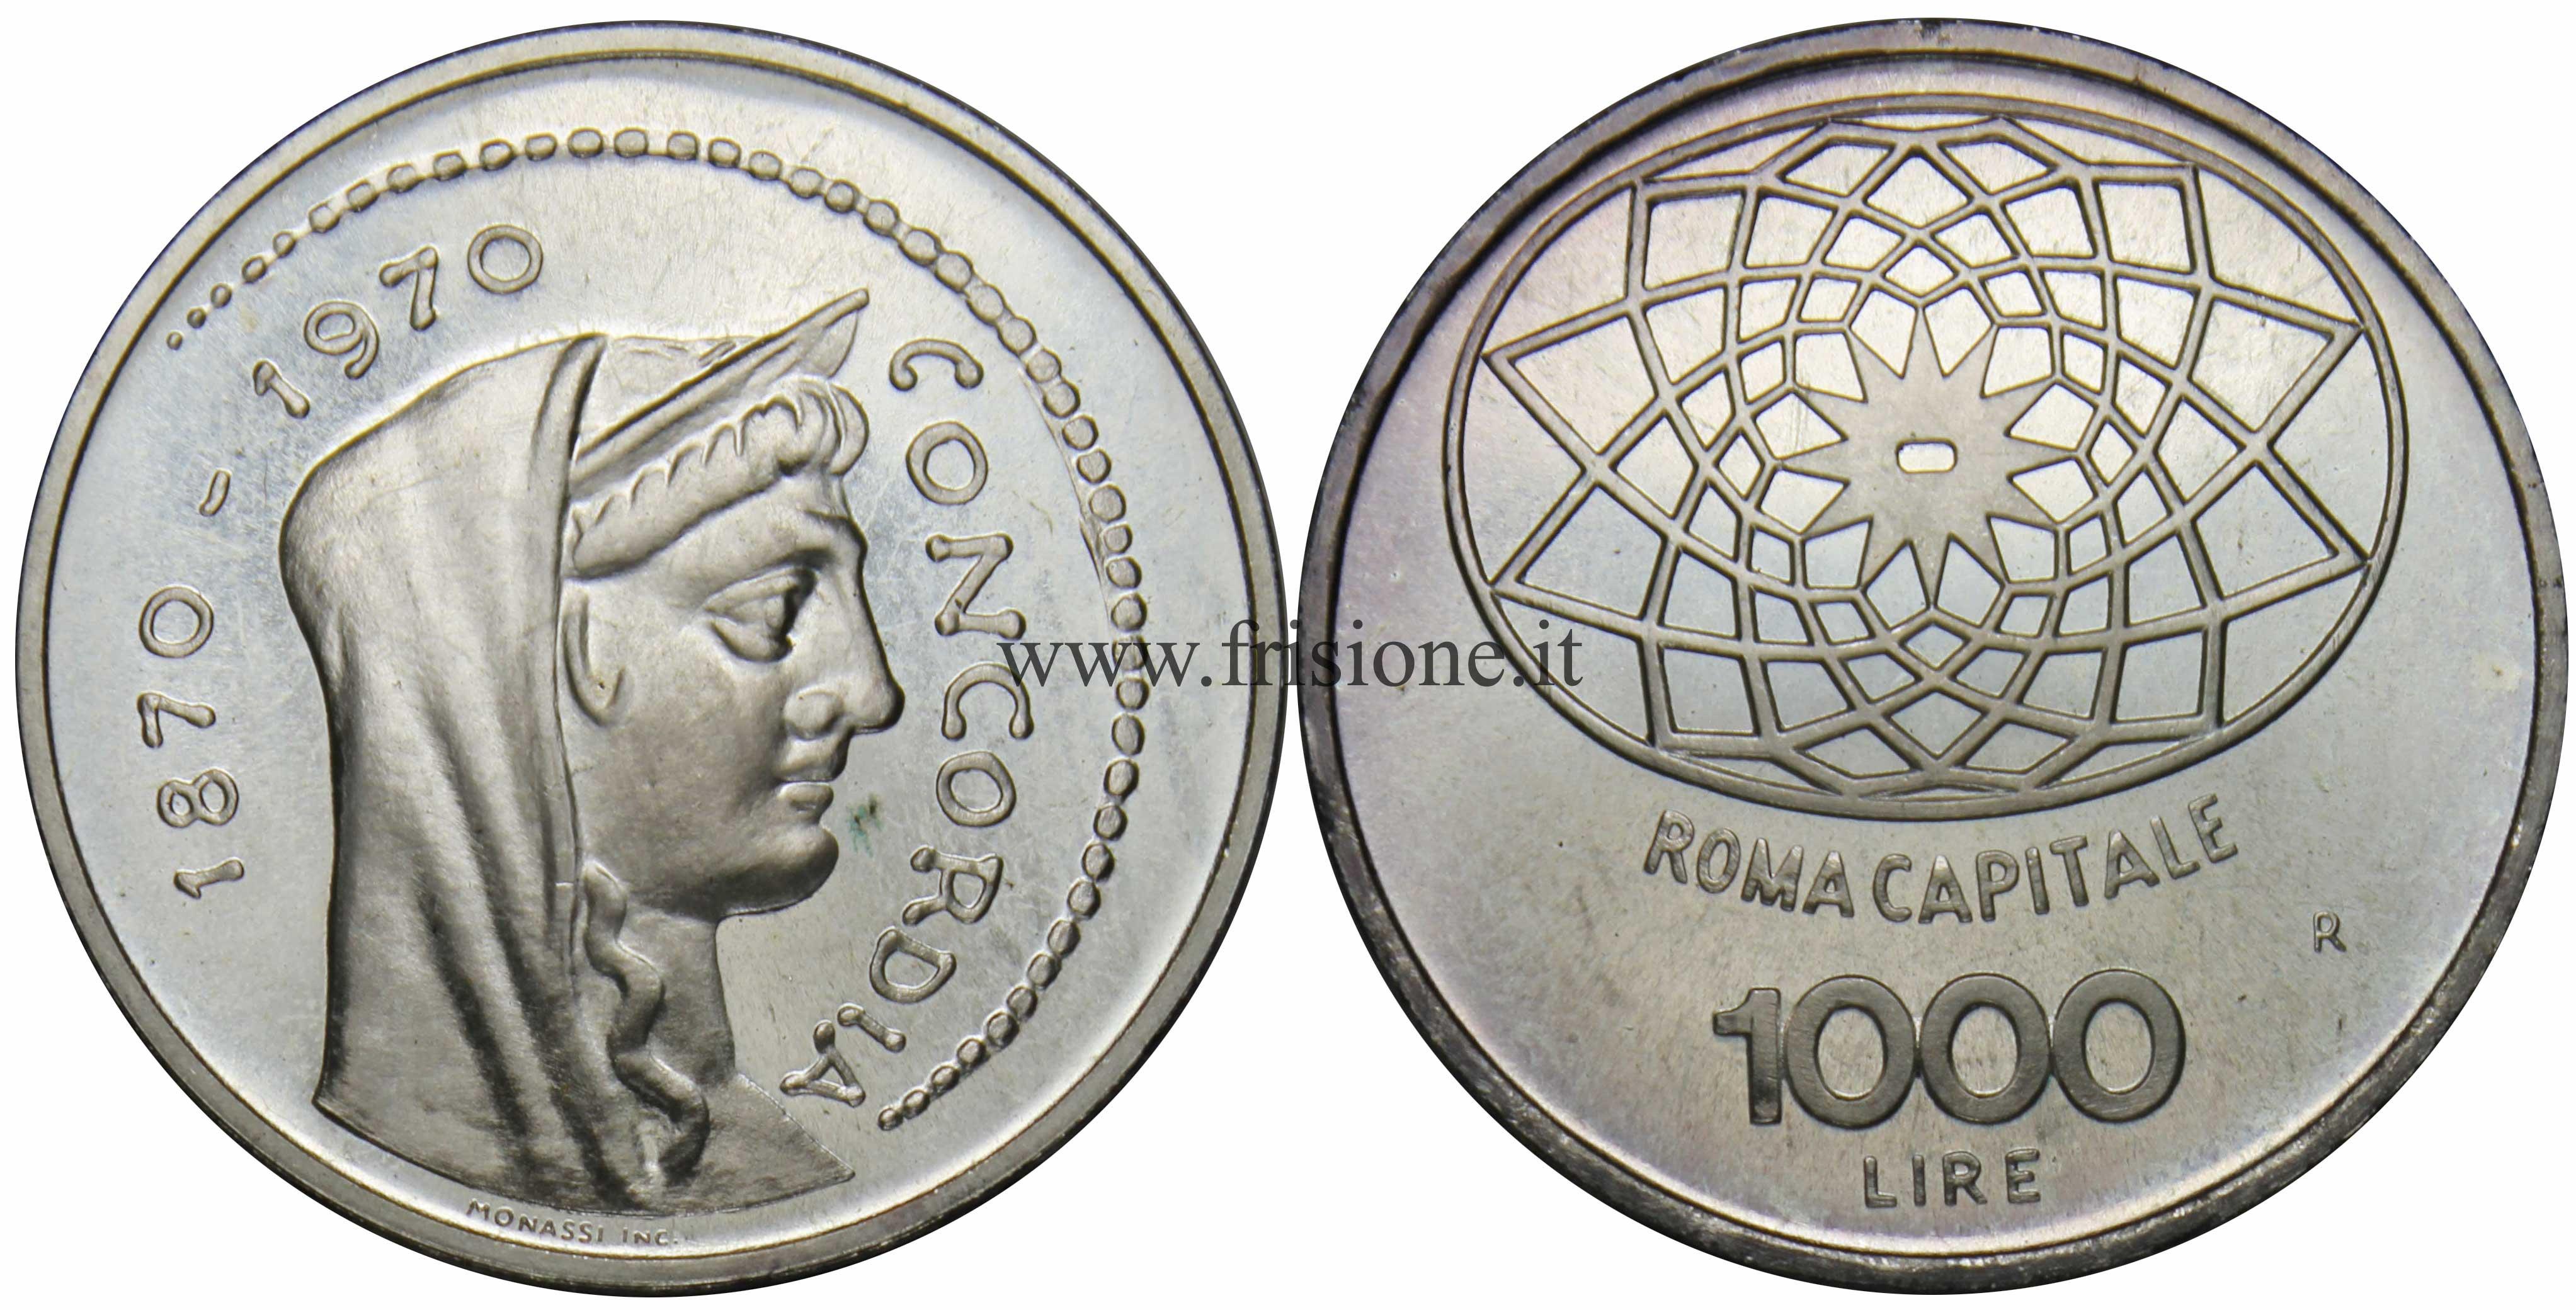 db3efa0d23 Italia - 1000 L. 1970 - Concordia